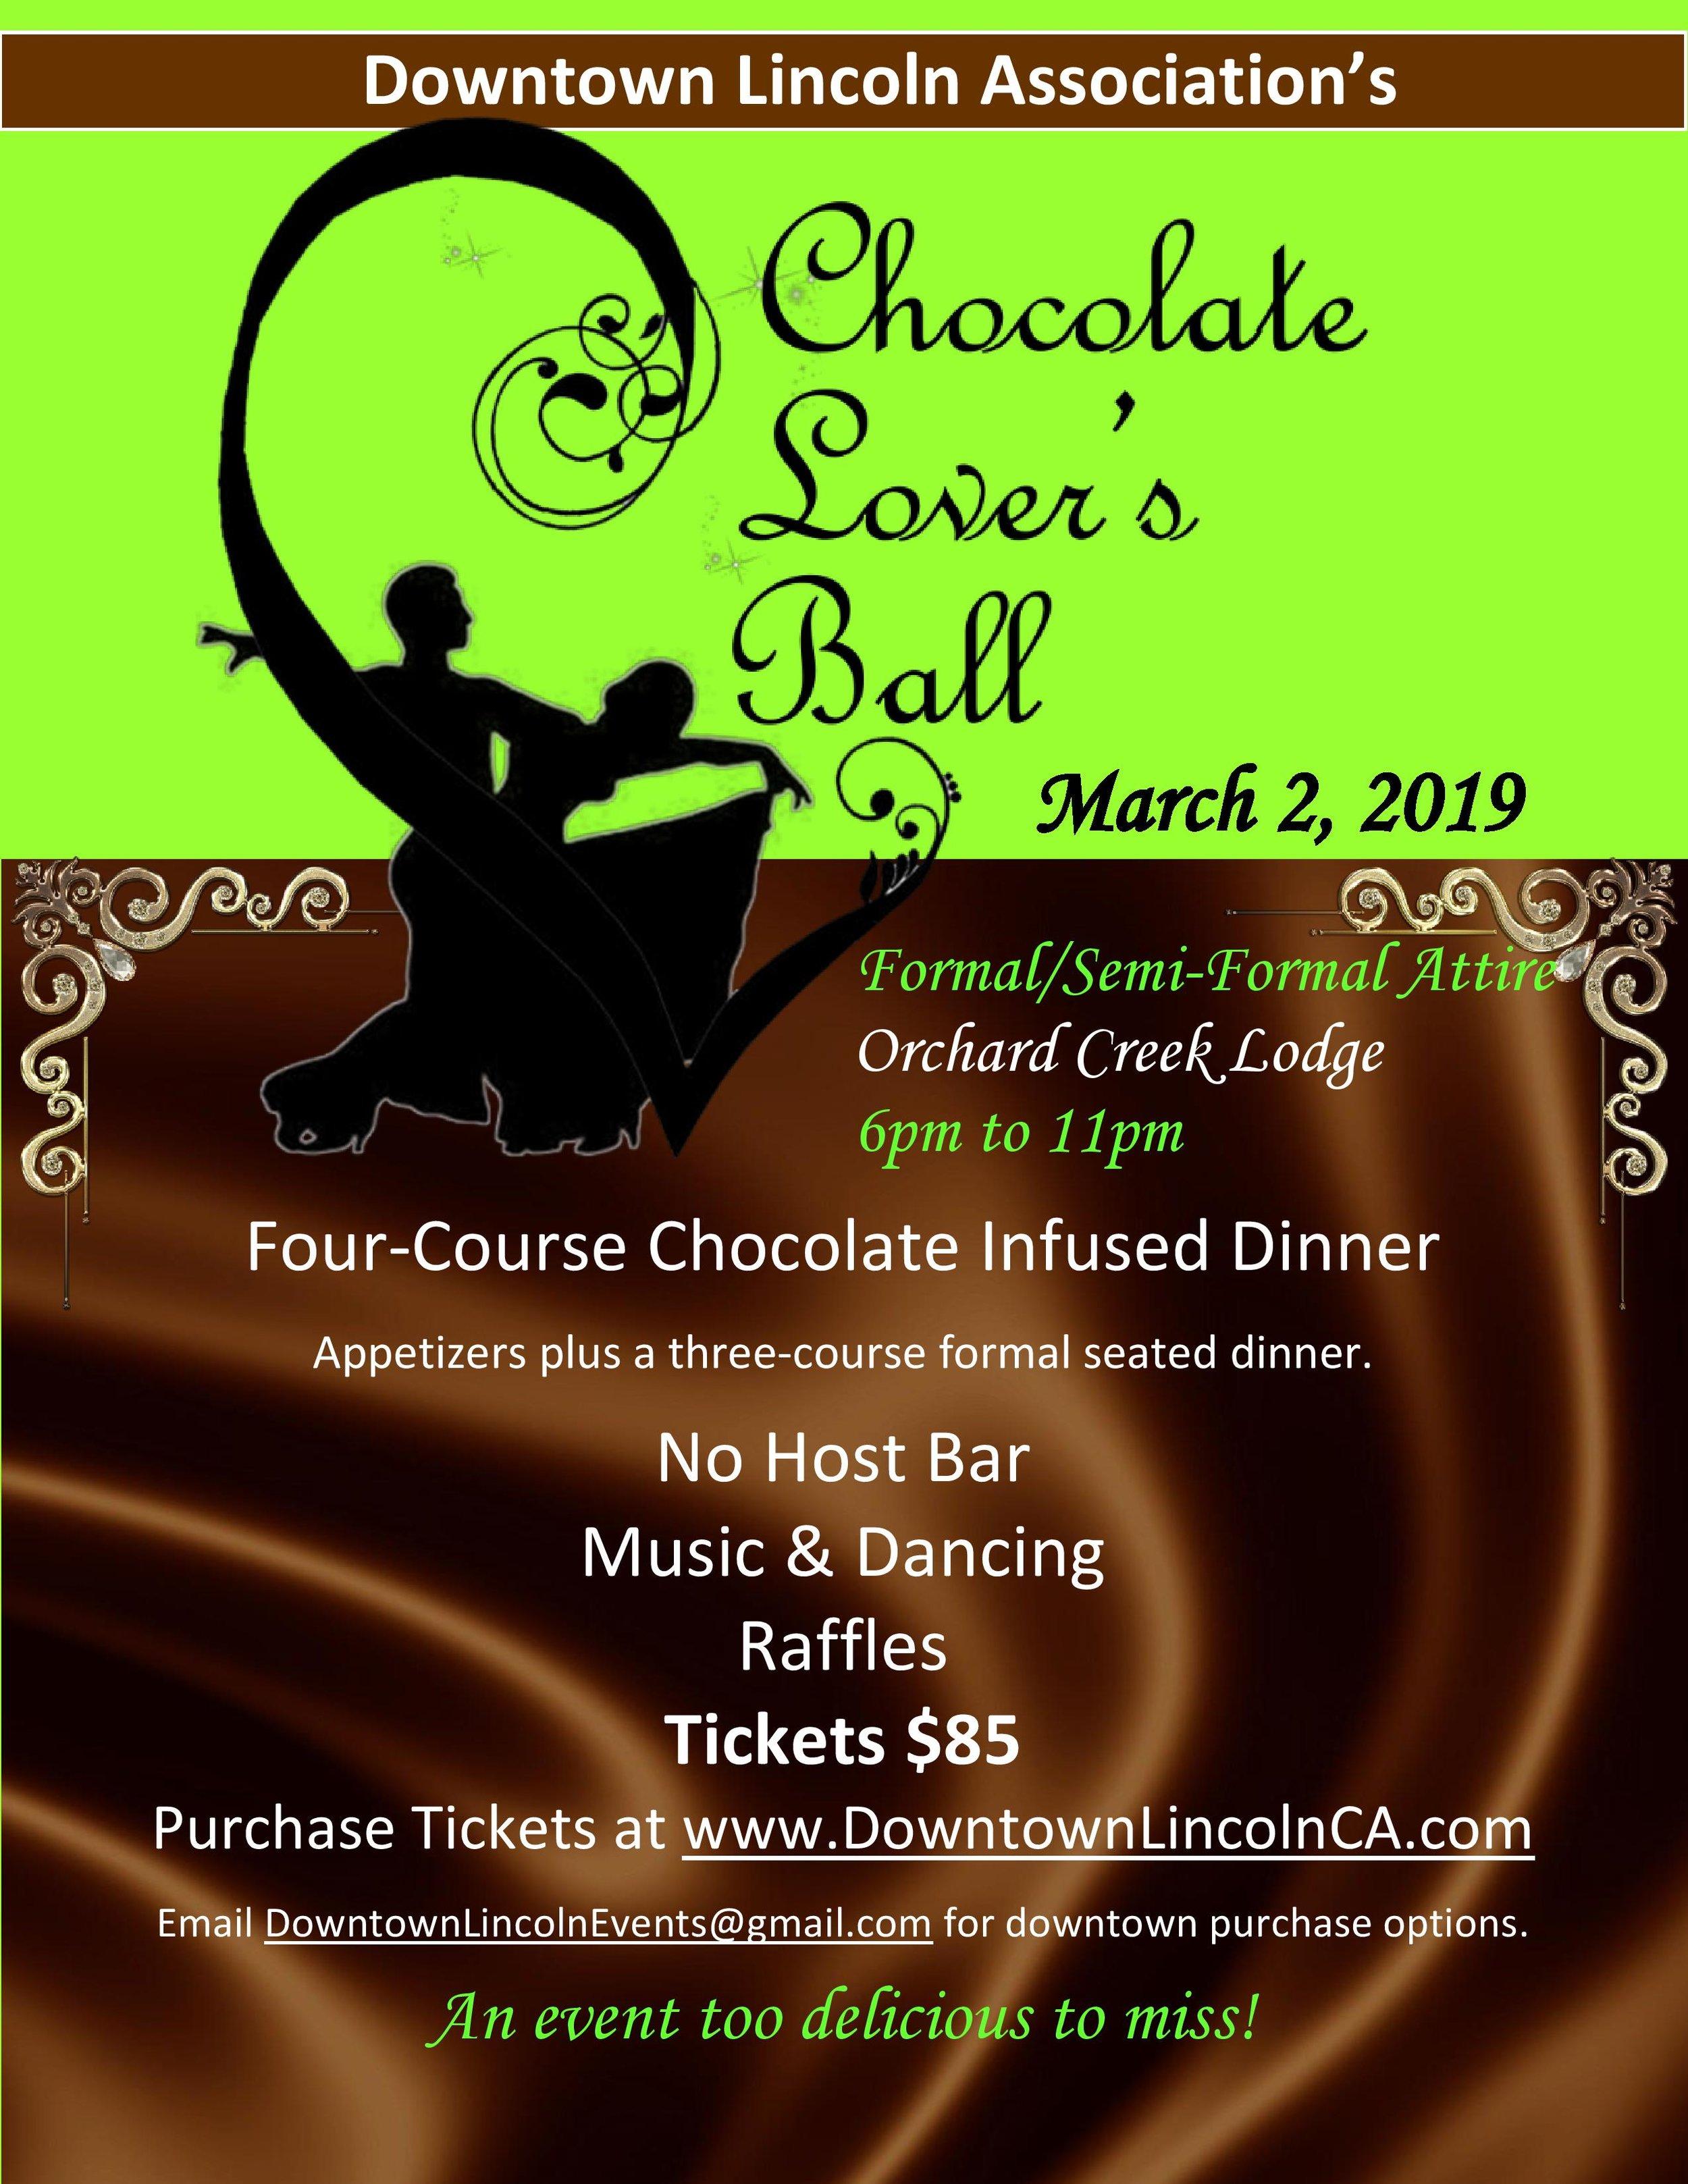 Chocolate Lover s Ball 2019 Poster-jpeg.jpg